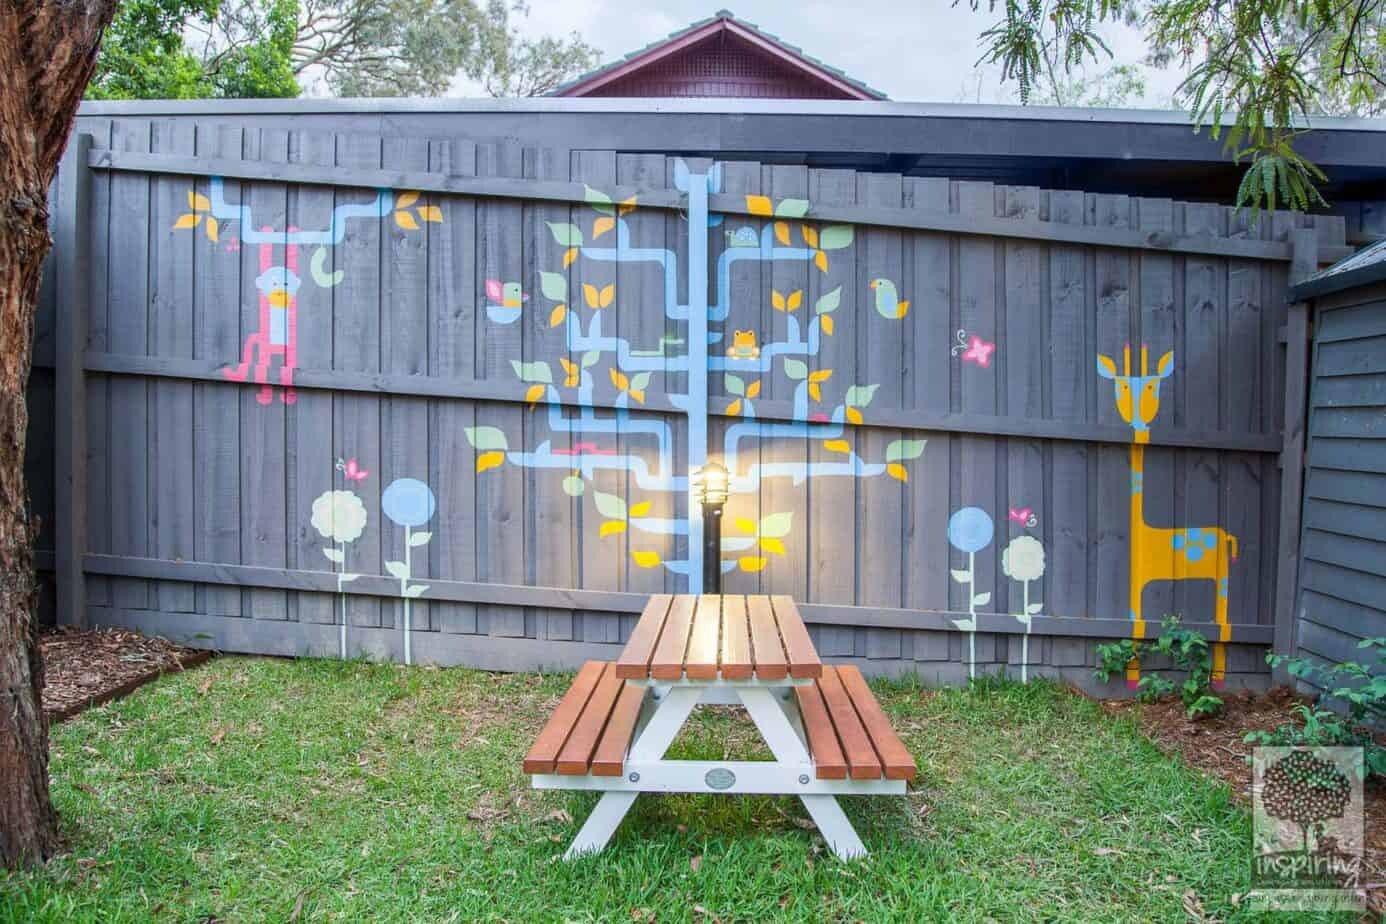 Kids mural used in Blackburn landscape design by Parveen Dhaliwal